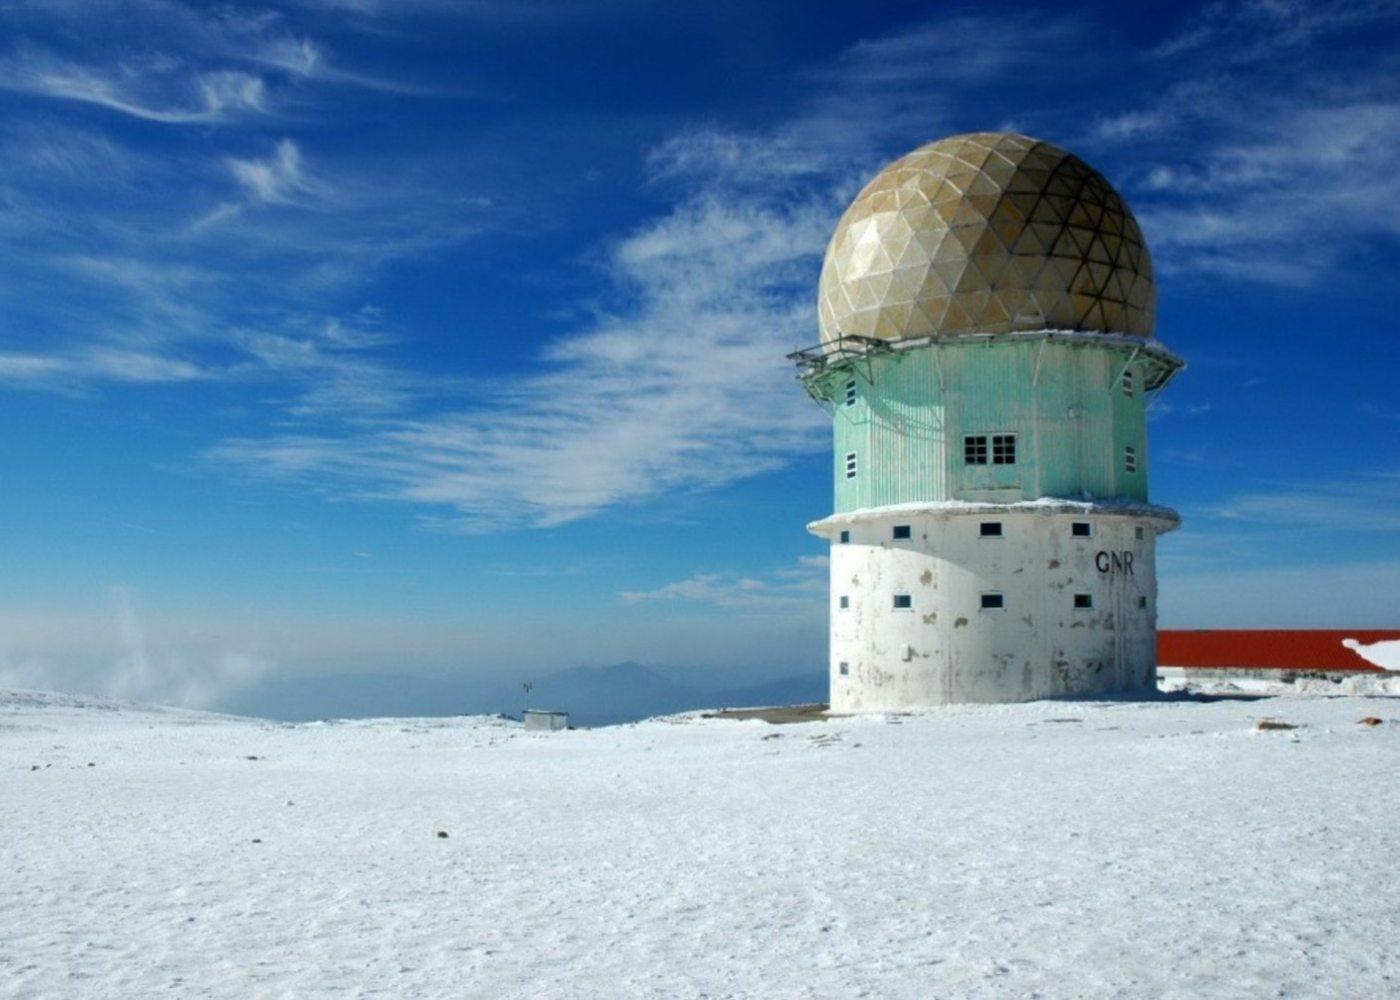 Neve na torre da Serra da Estrela